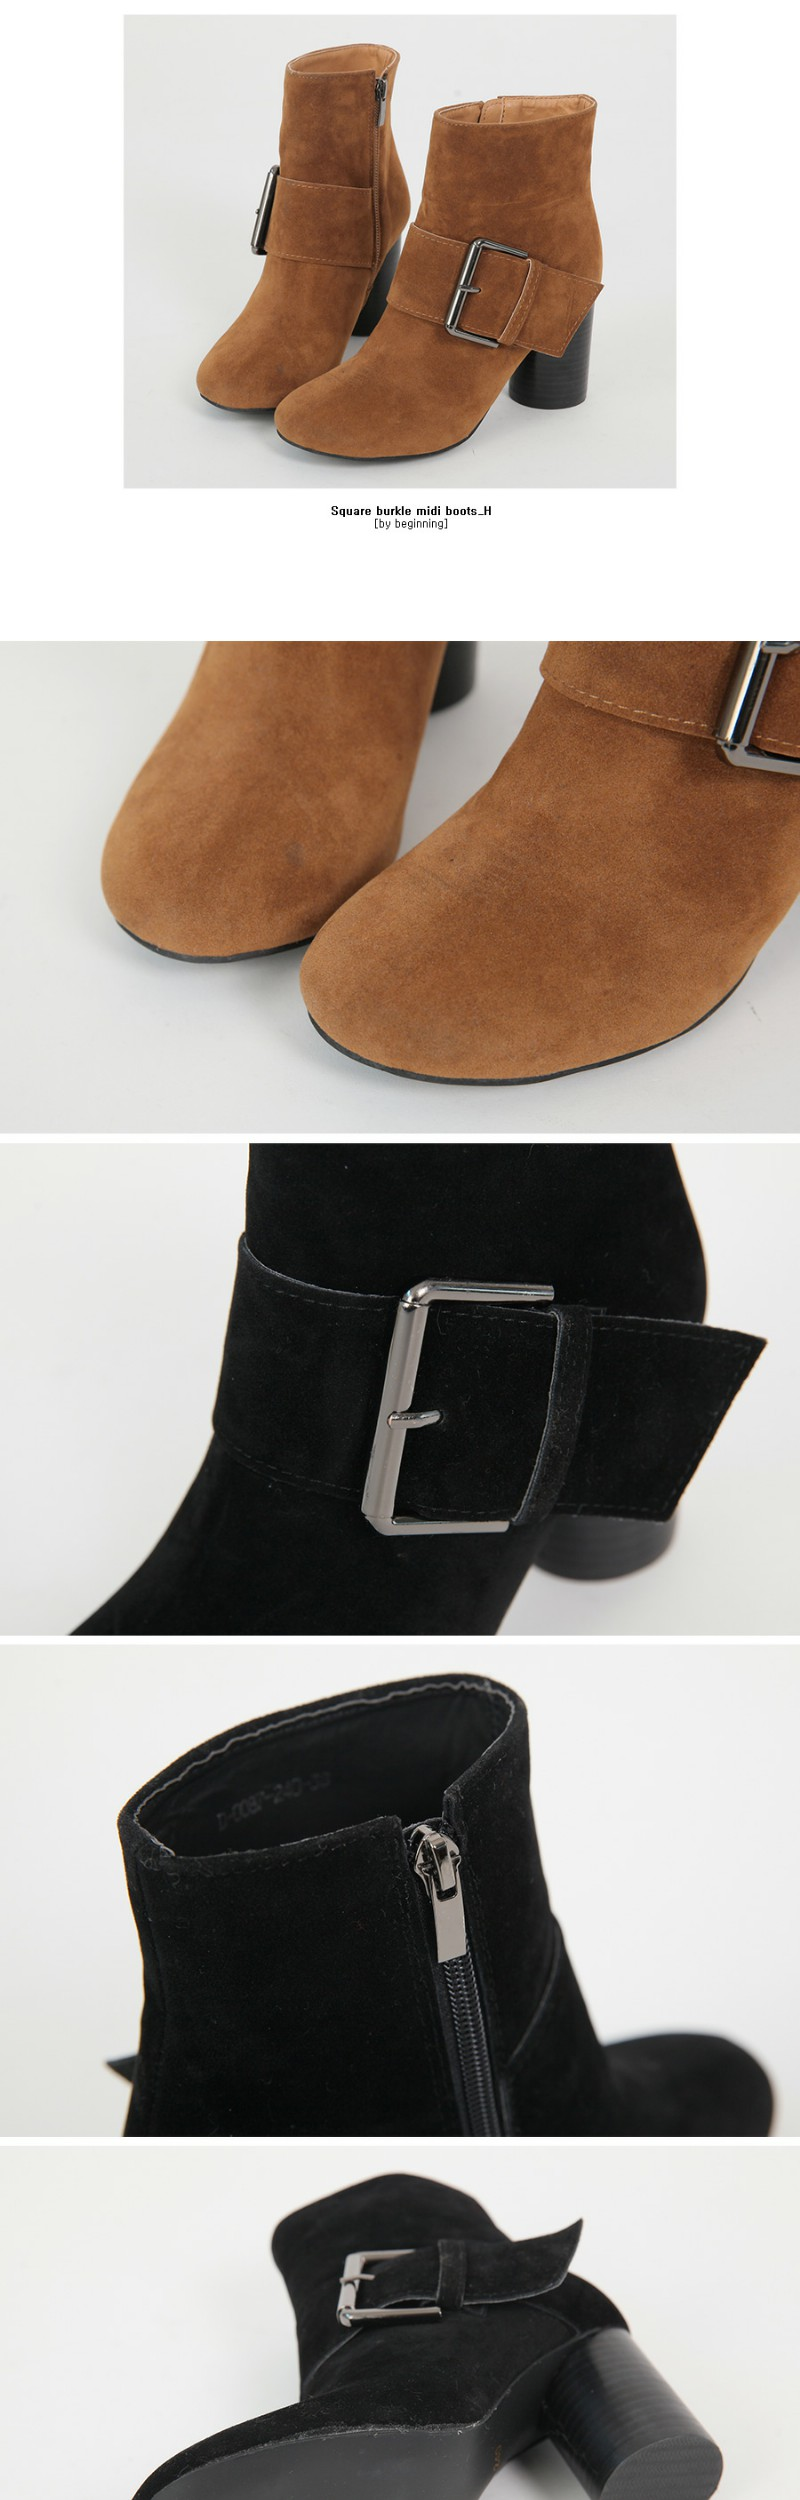 Square burkle midi boots_H(퀄리티감이 느껴지는 스웨이드 질감에 빅 버클 포인트만으로 세련된 멋스러움을 드리는 앵클부티)